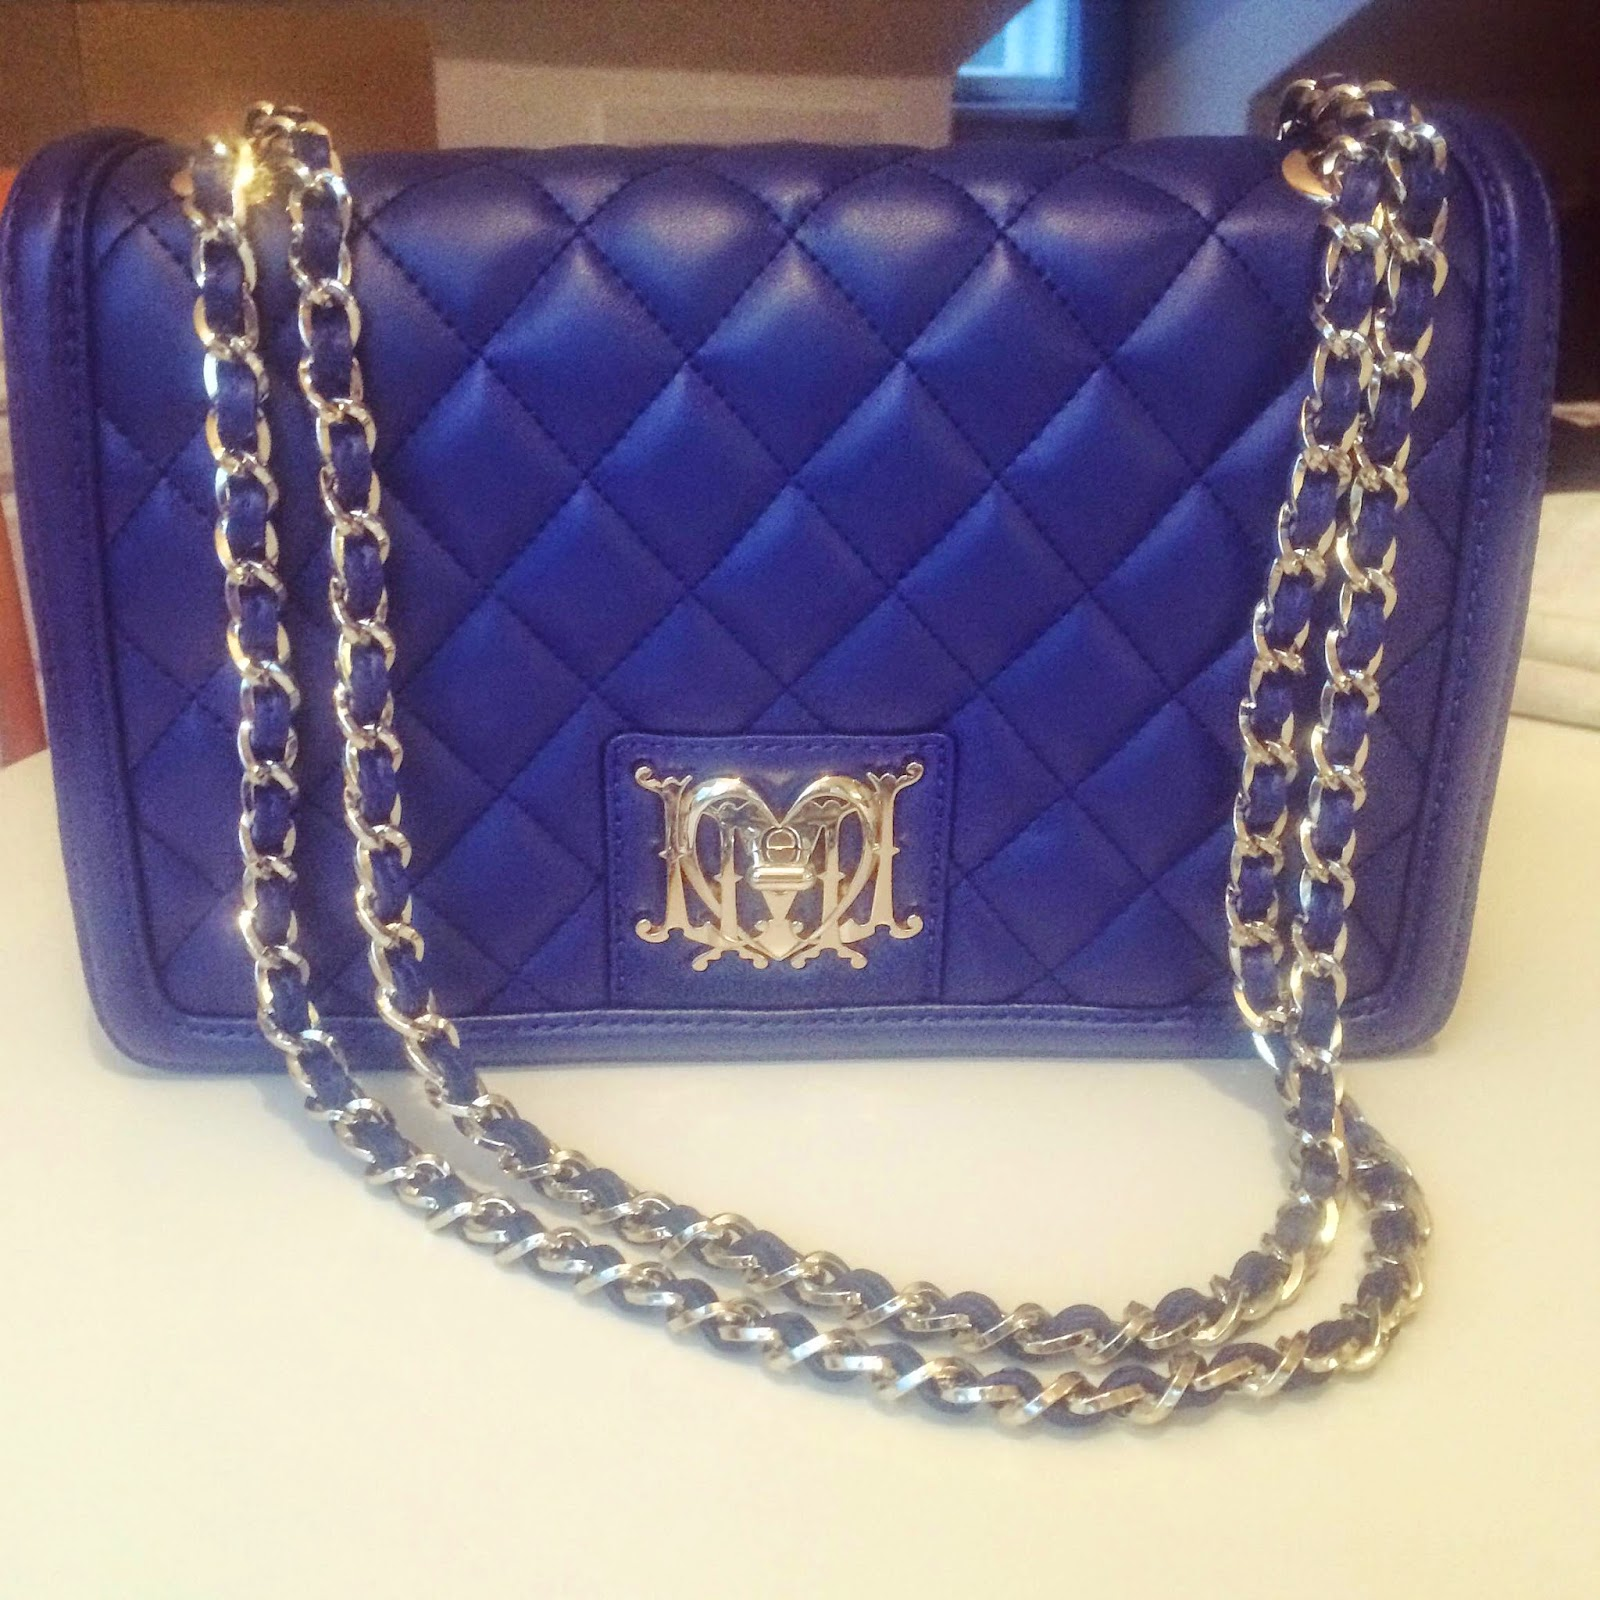 love-moschino-blue-handbag